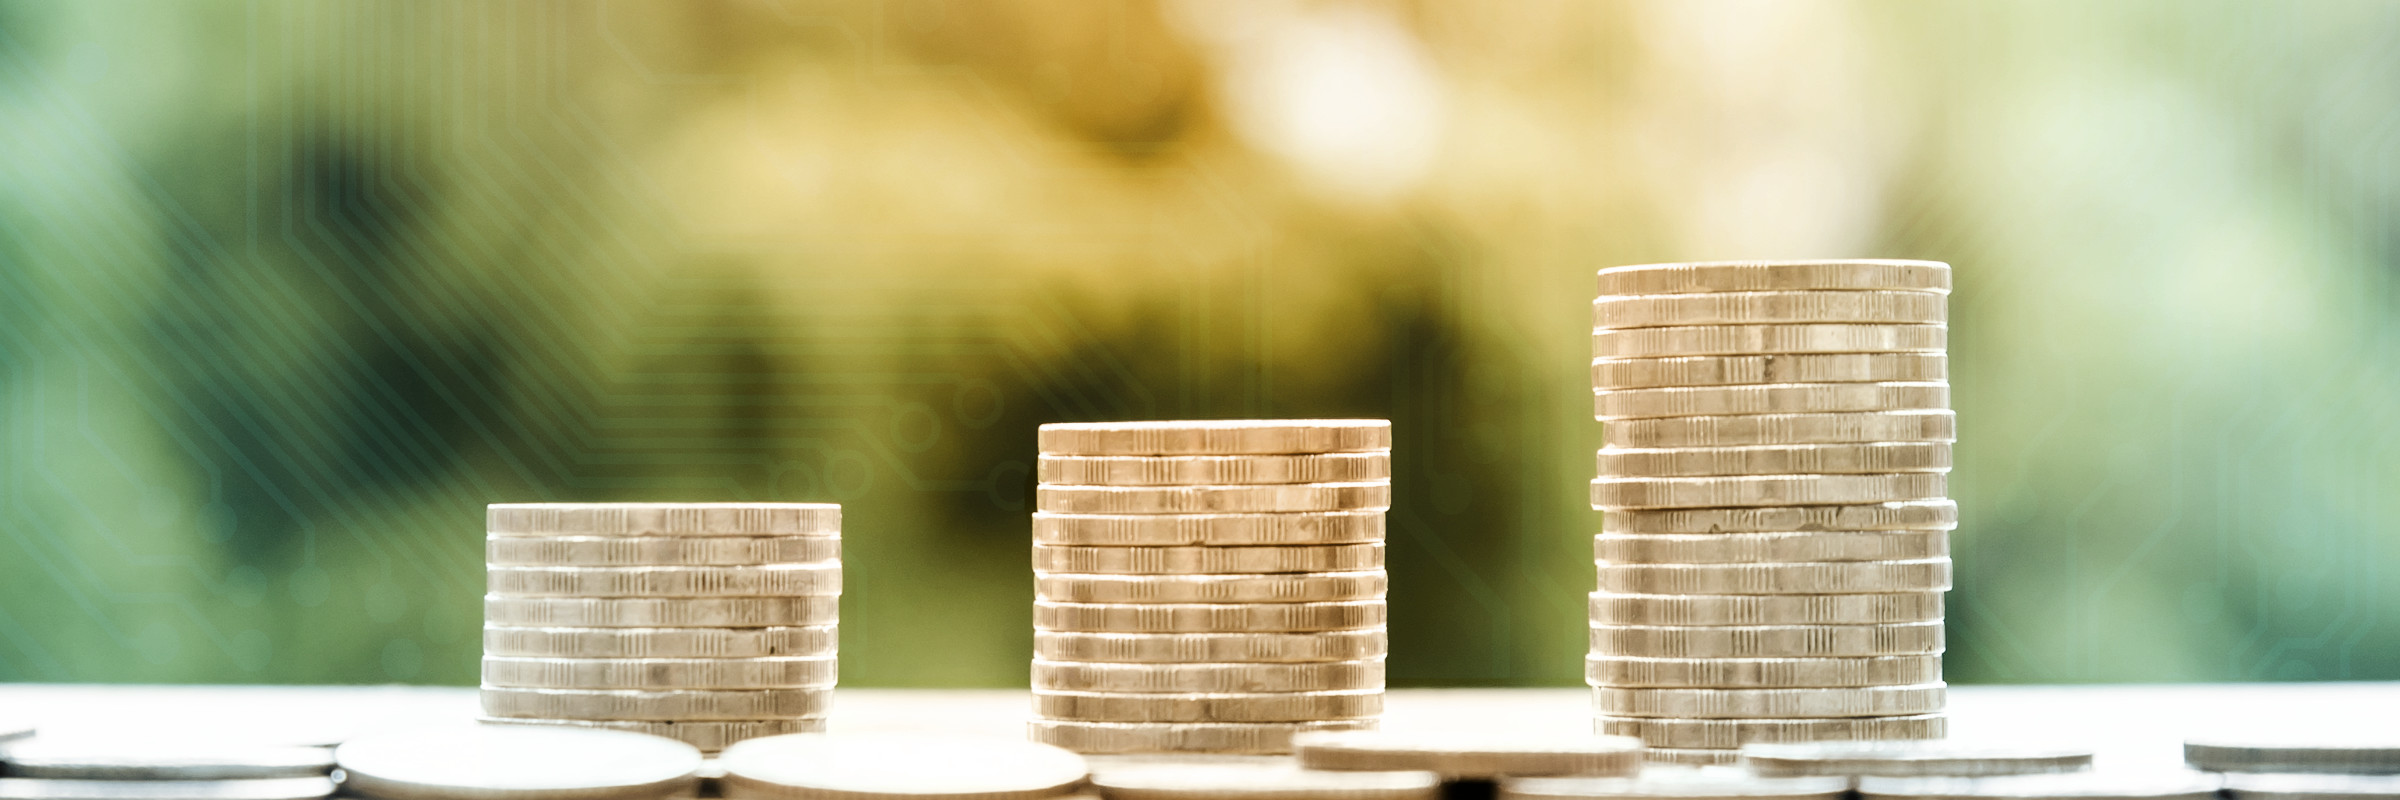 techsource_IoT_wealth